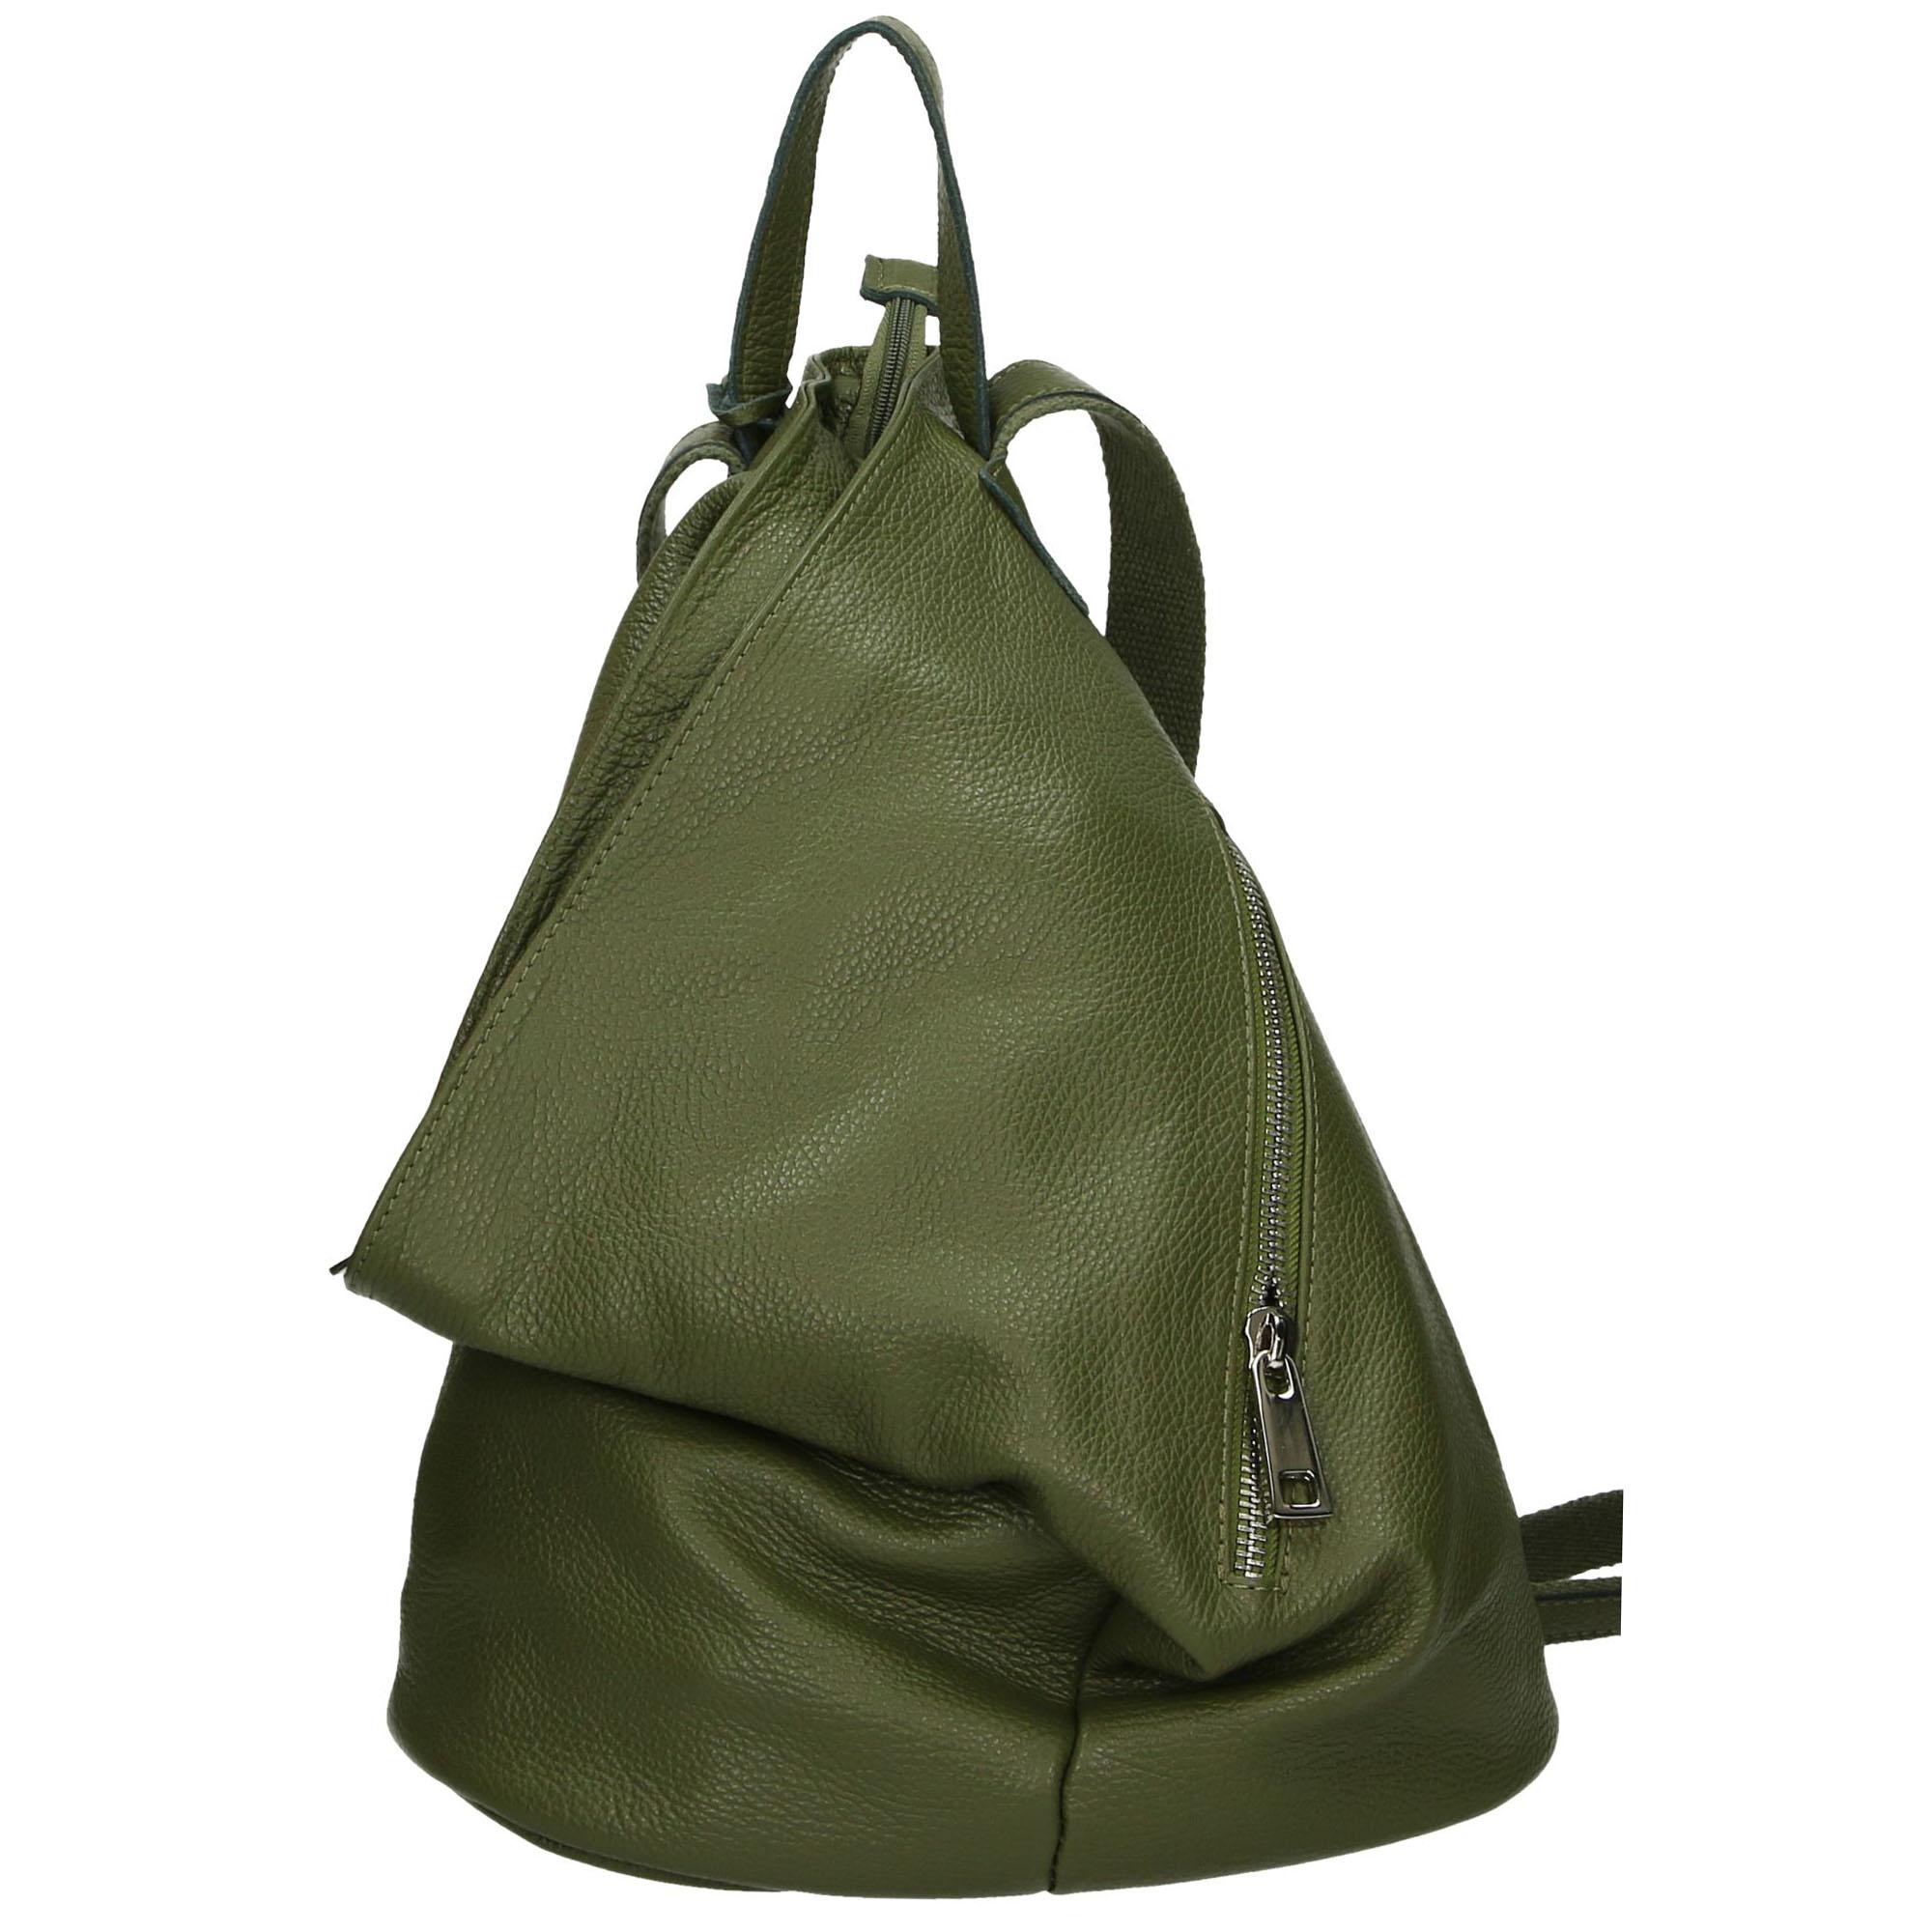 Plecak zielony Venezia